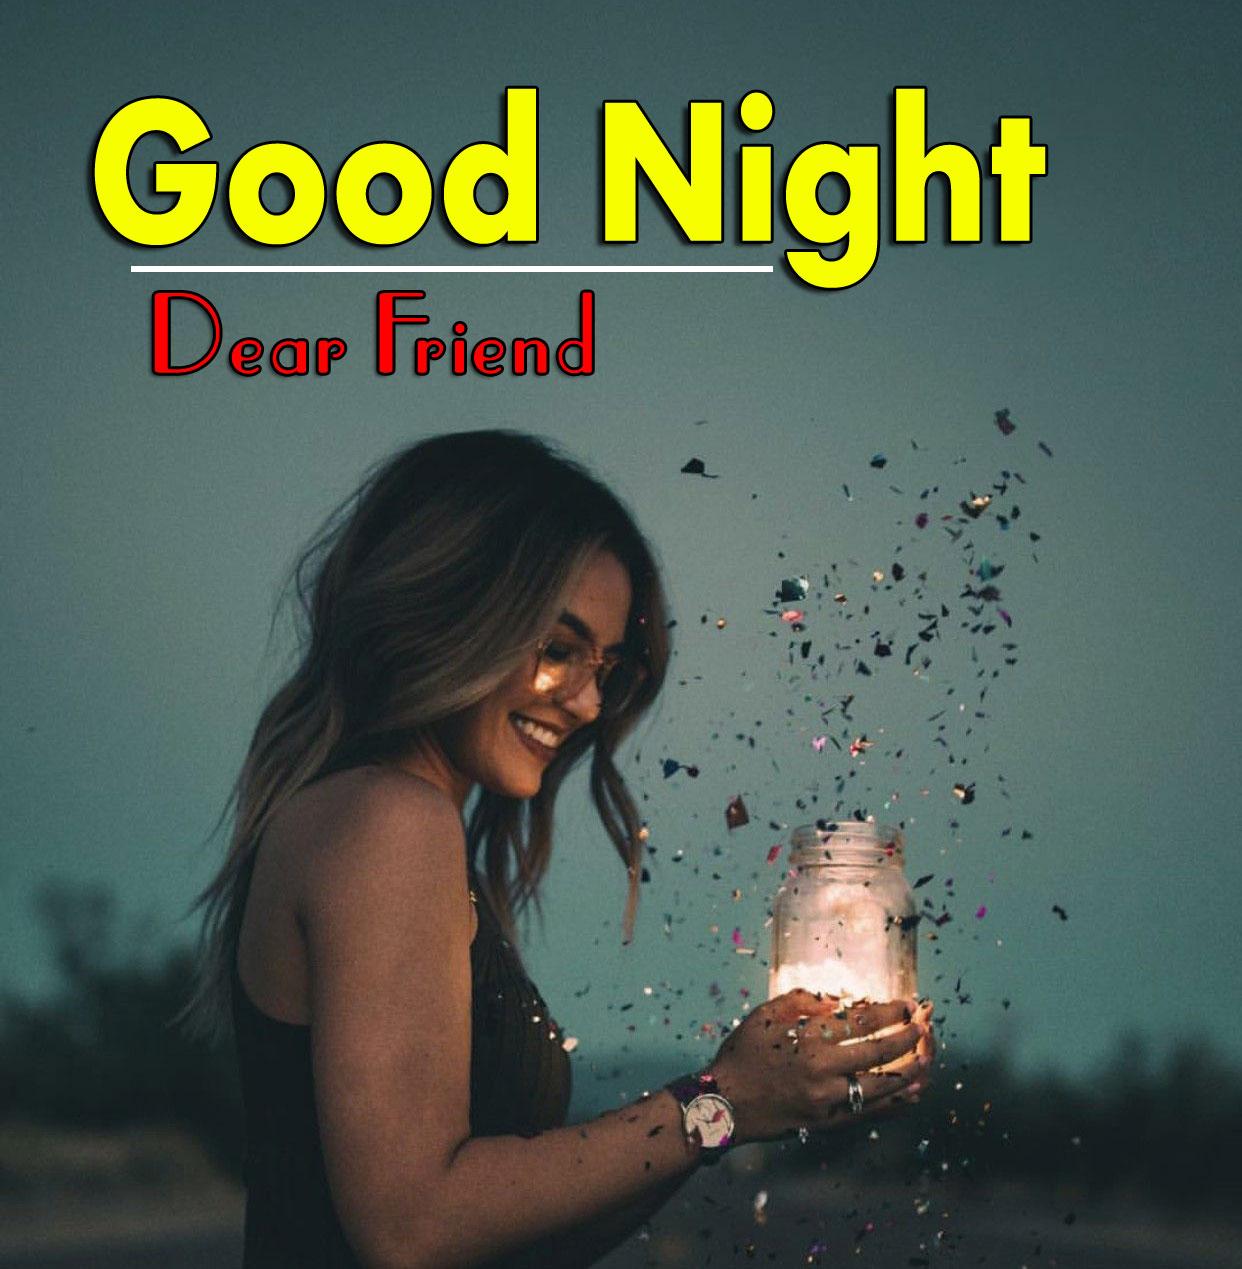 Good Night Images Hd Free